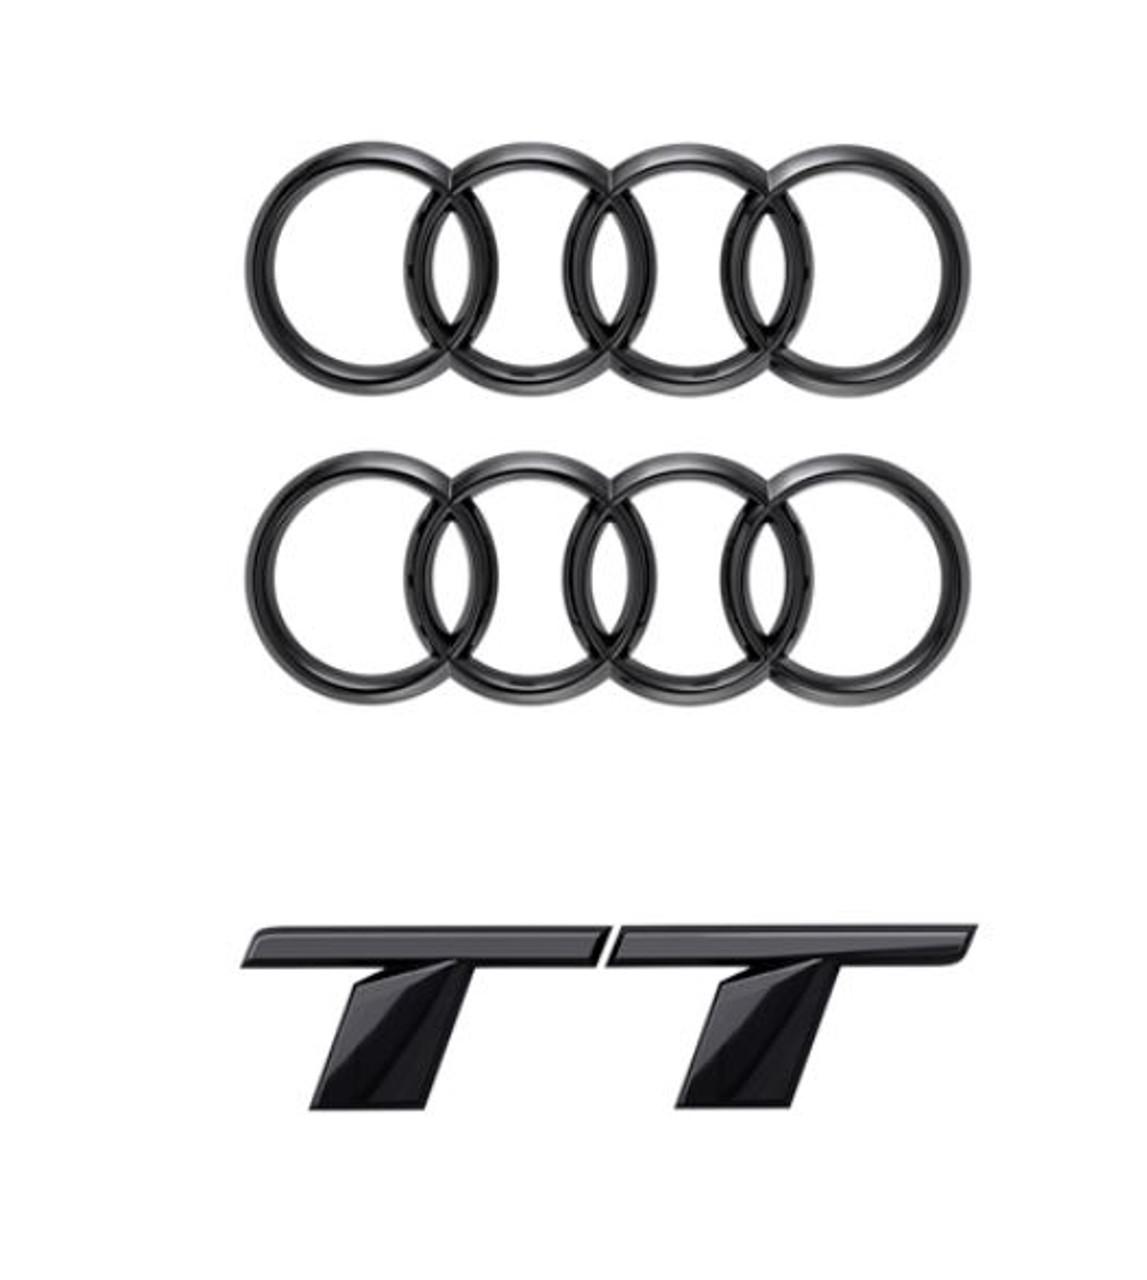 Genuine Audi Black Badge Kit - TT 2019+